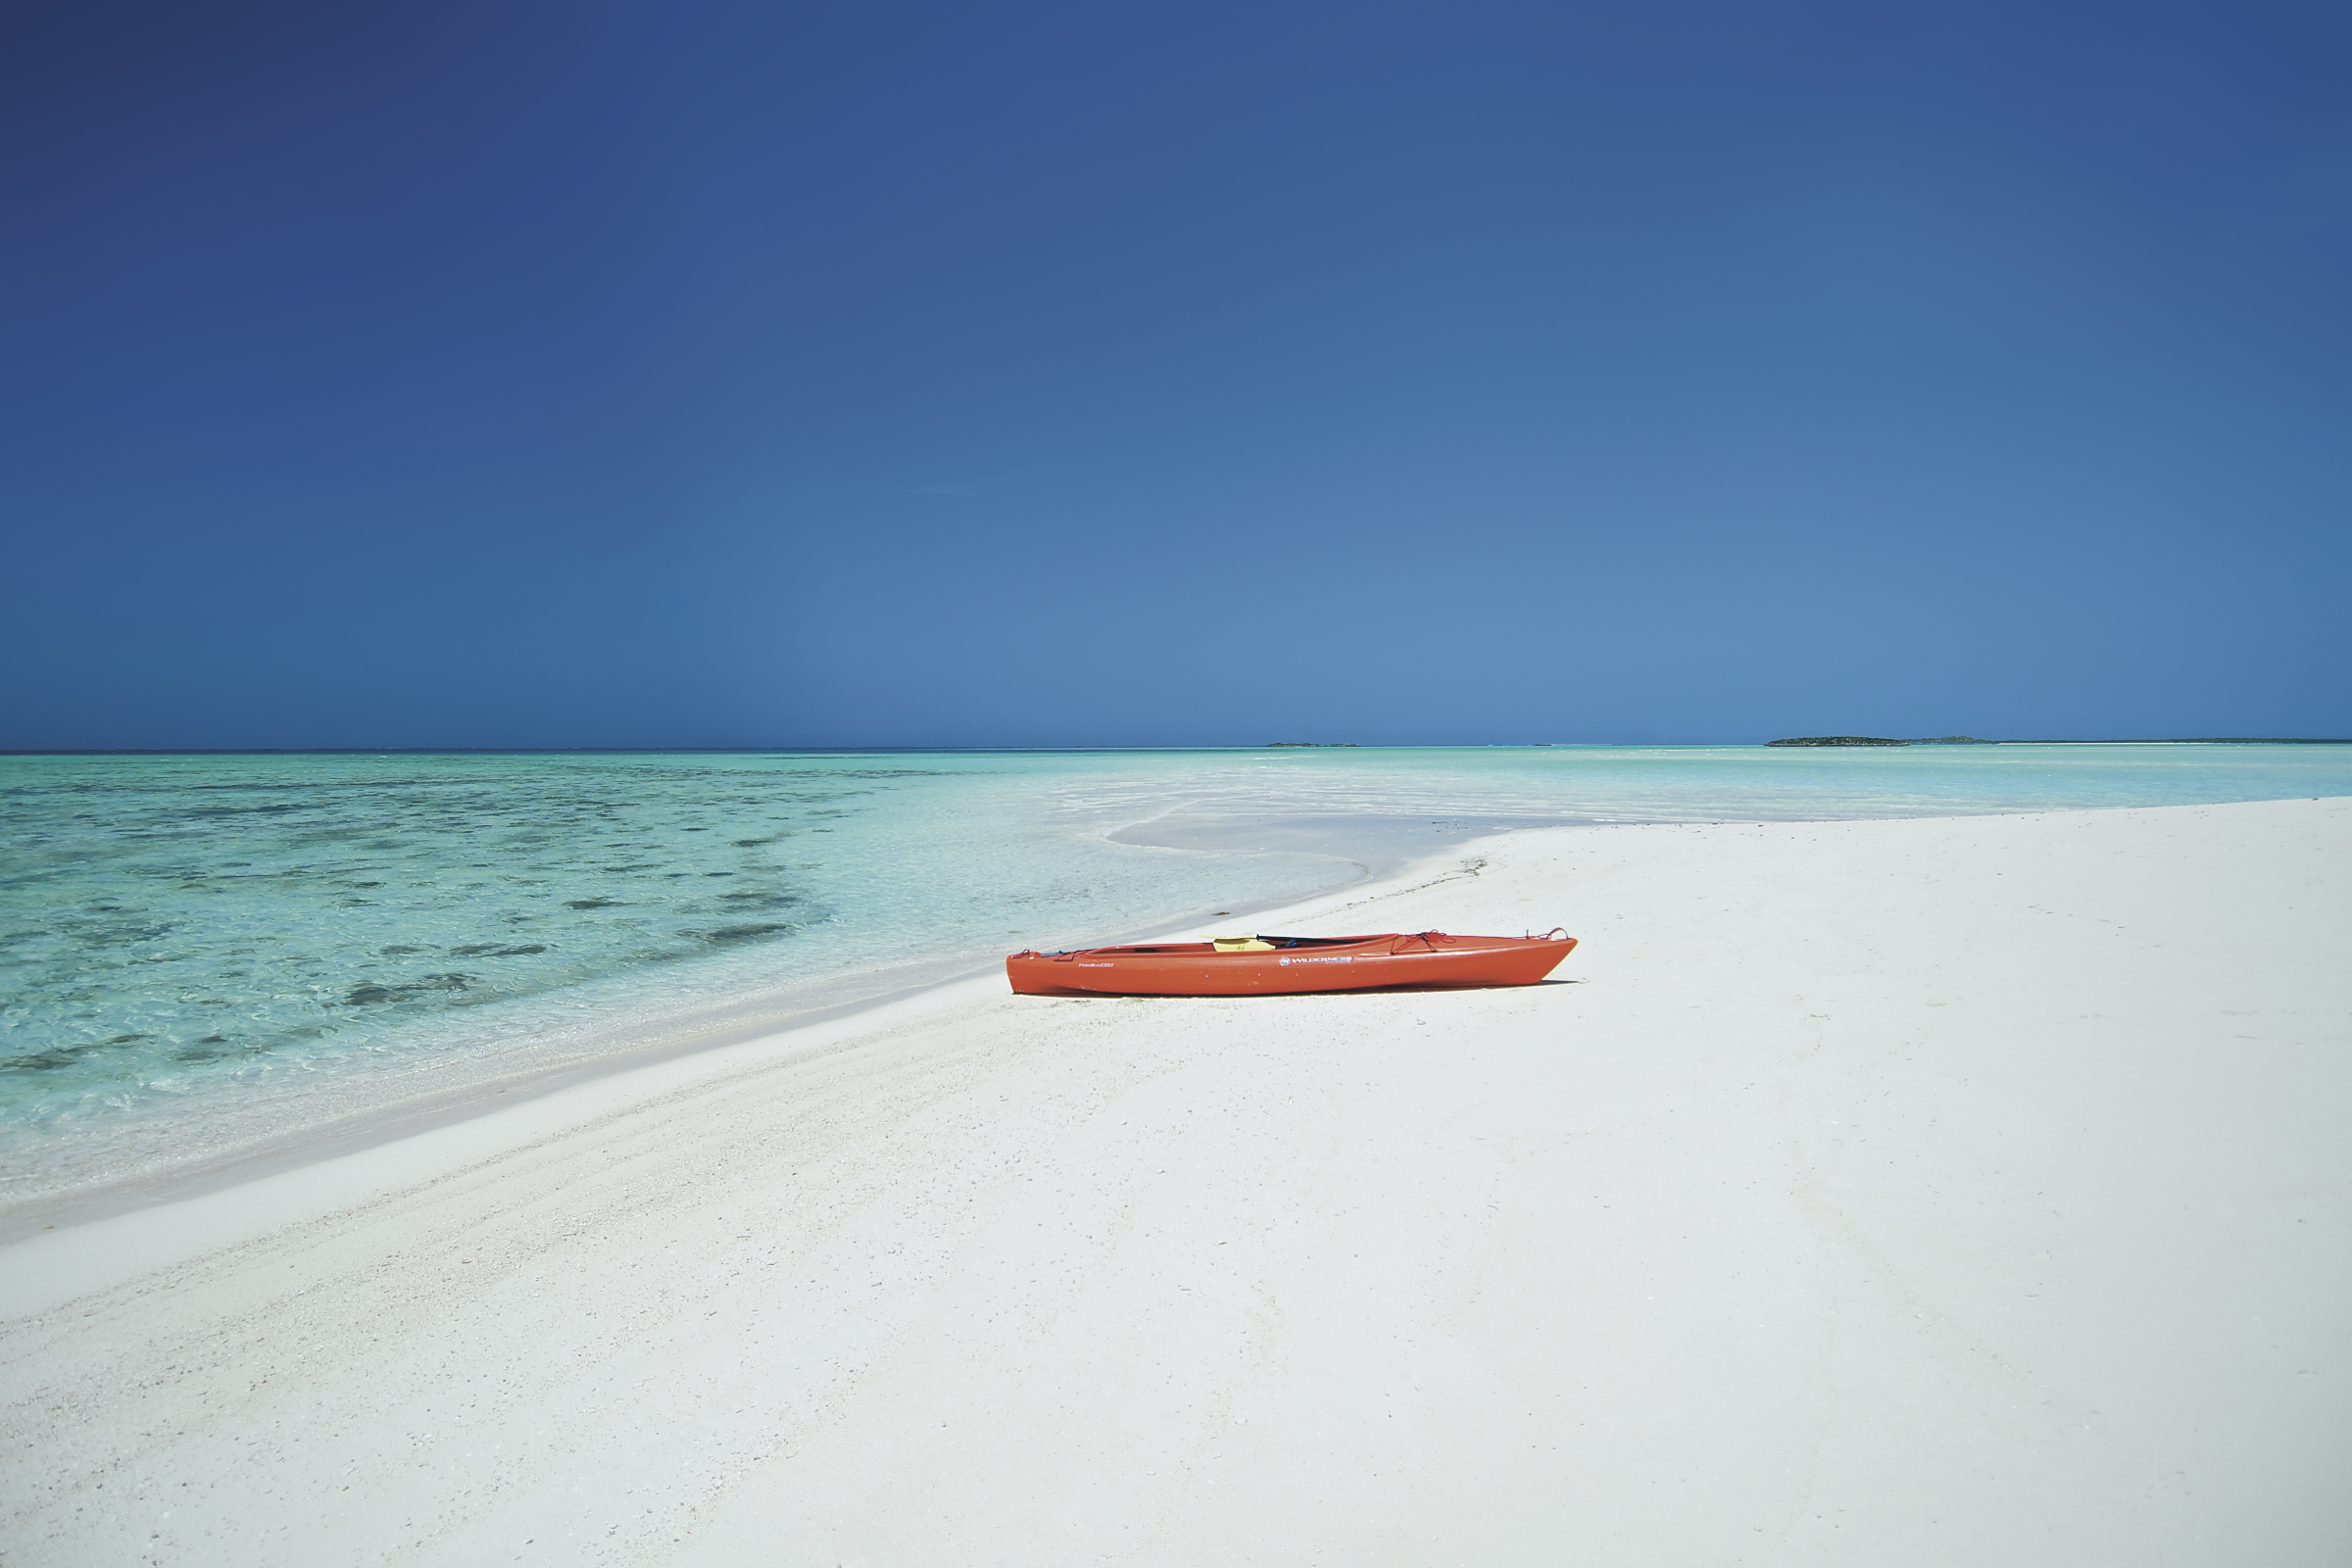 Kayak & Beach Kim Mortimer .jpg